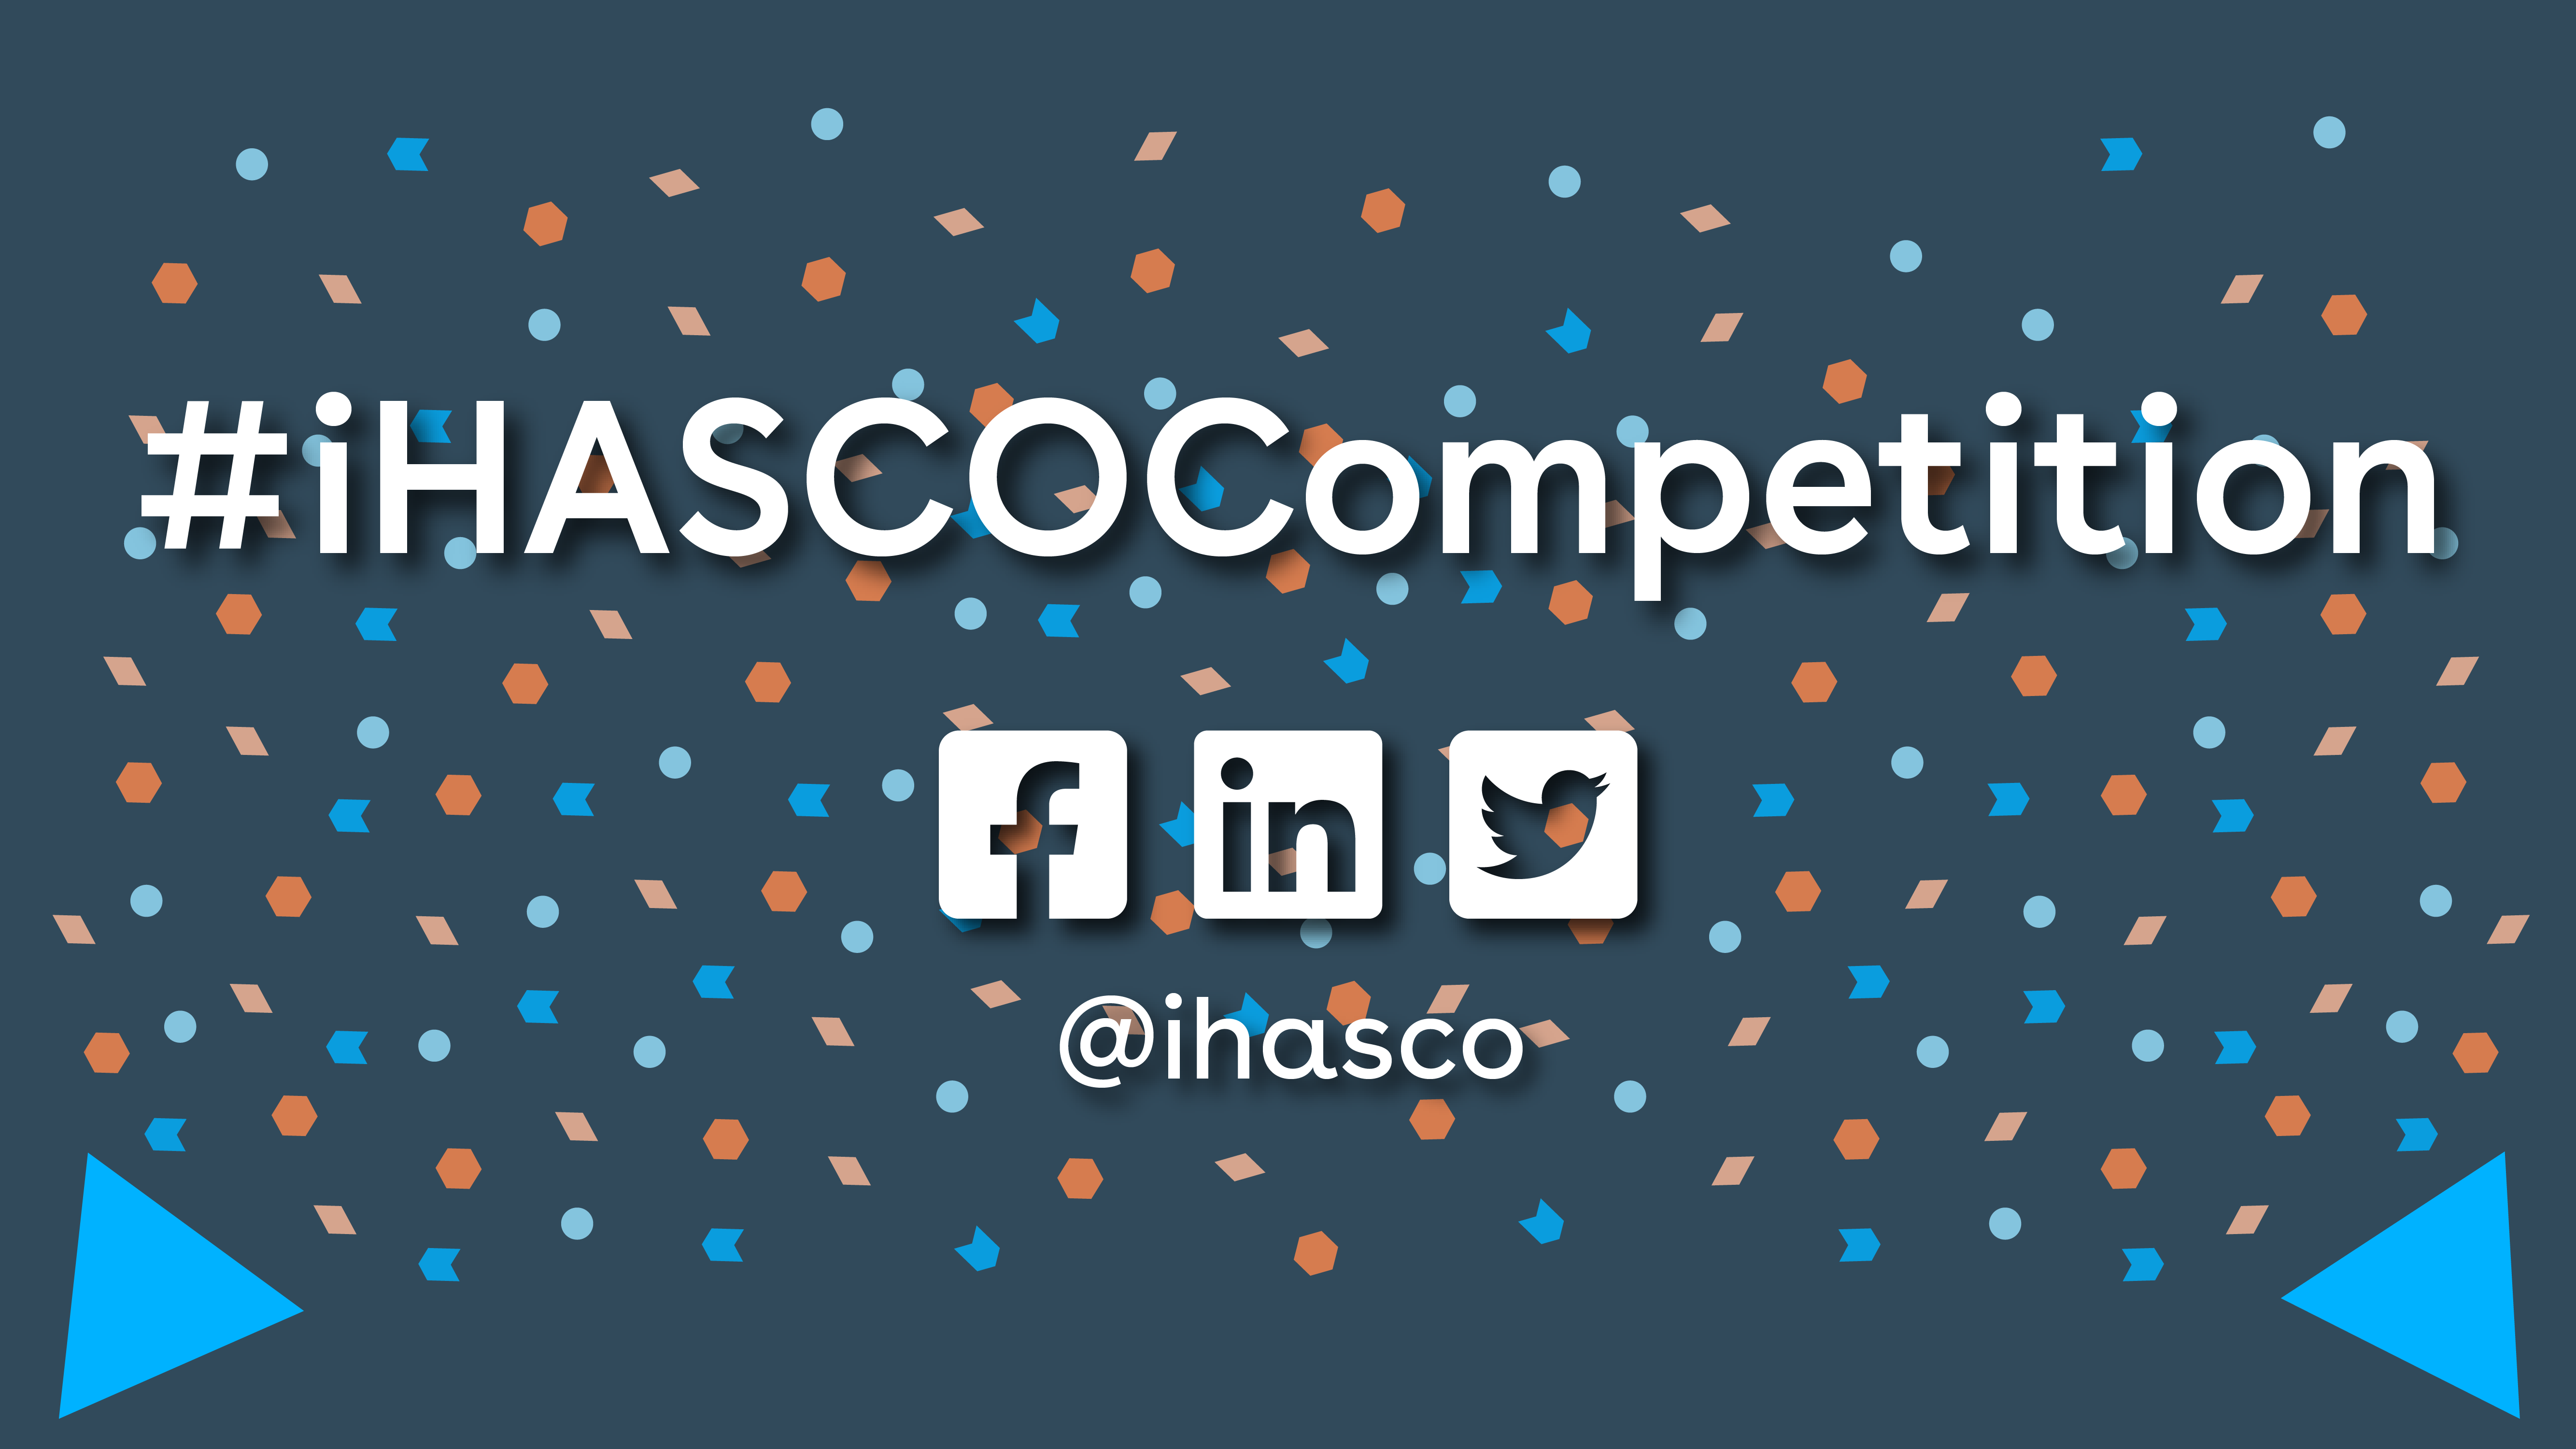 iHASCO Competition